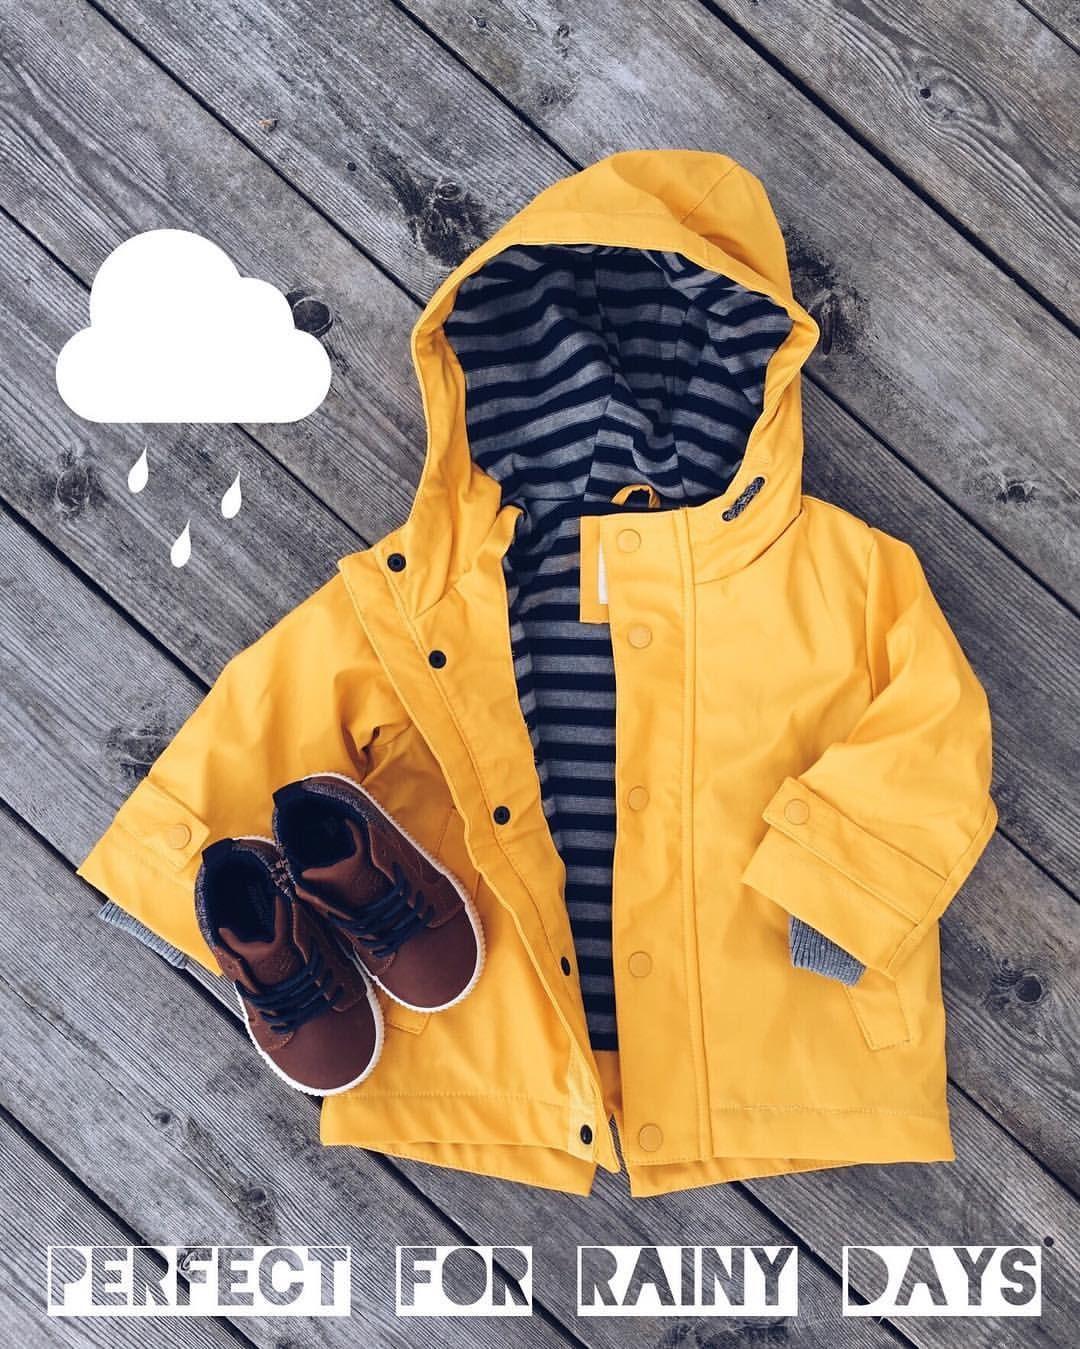 "⠀⠀⠀⠀⠀⠀⠀⠀⠀⠀⠀⠀⠀ ⠀🌺 Aмαℓιє på Instagram: ""Yєℓℓσω 🐯 Denne jakken er perfekt for det sure været vi har om dagene!🌧🌪 ᴠᴀᴋᴋᴇ ᴍʏᴇ sᴏᴍᴍᴇʀ ᴠɪ ғɪᴋᴋ ɪ åʀ (ʜᴇʟʟᴇʀ) ɢɪᴛᴛ.. Men da hadde jeg hvertfall en excuse til å kjøpe denne kule jakken til Matheo 😄🌼 #zarakids #yellow #raincoat #loveit #newin #babyboy #fresh #summer #is #over #autumn #is #here ✌🏼️"""